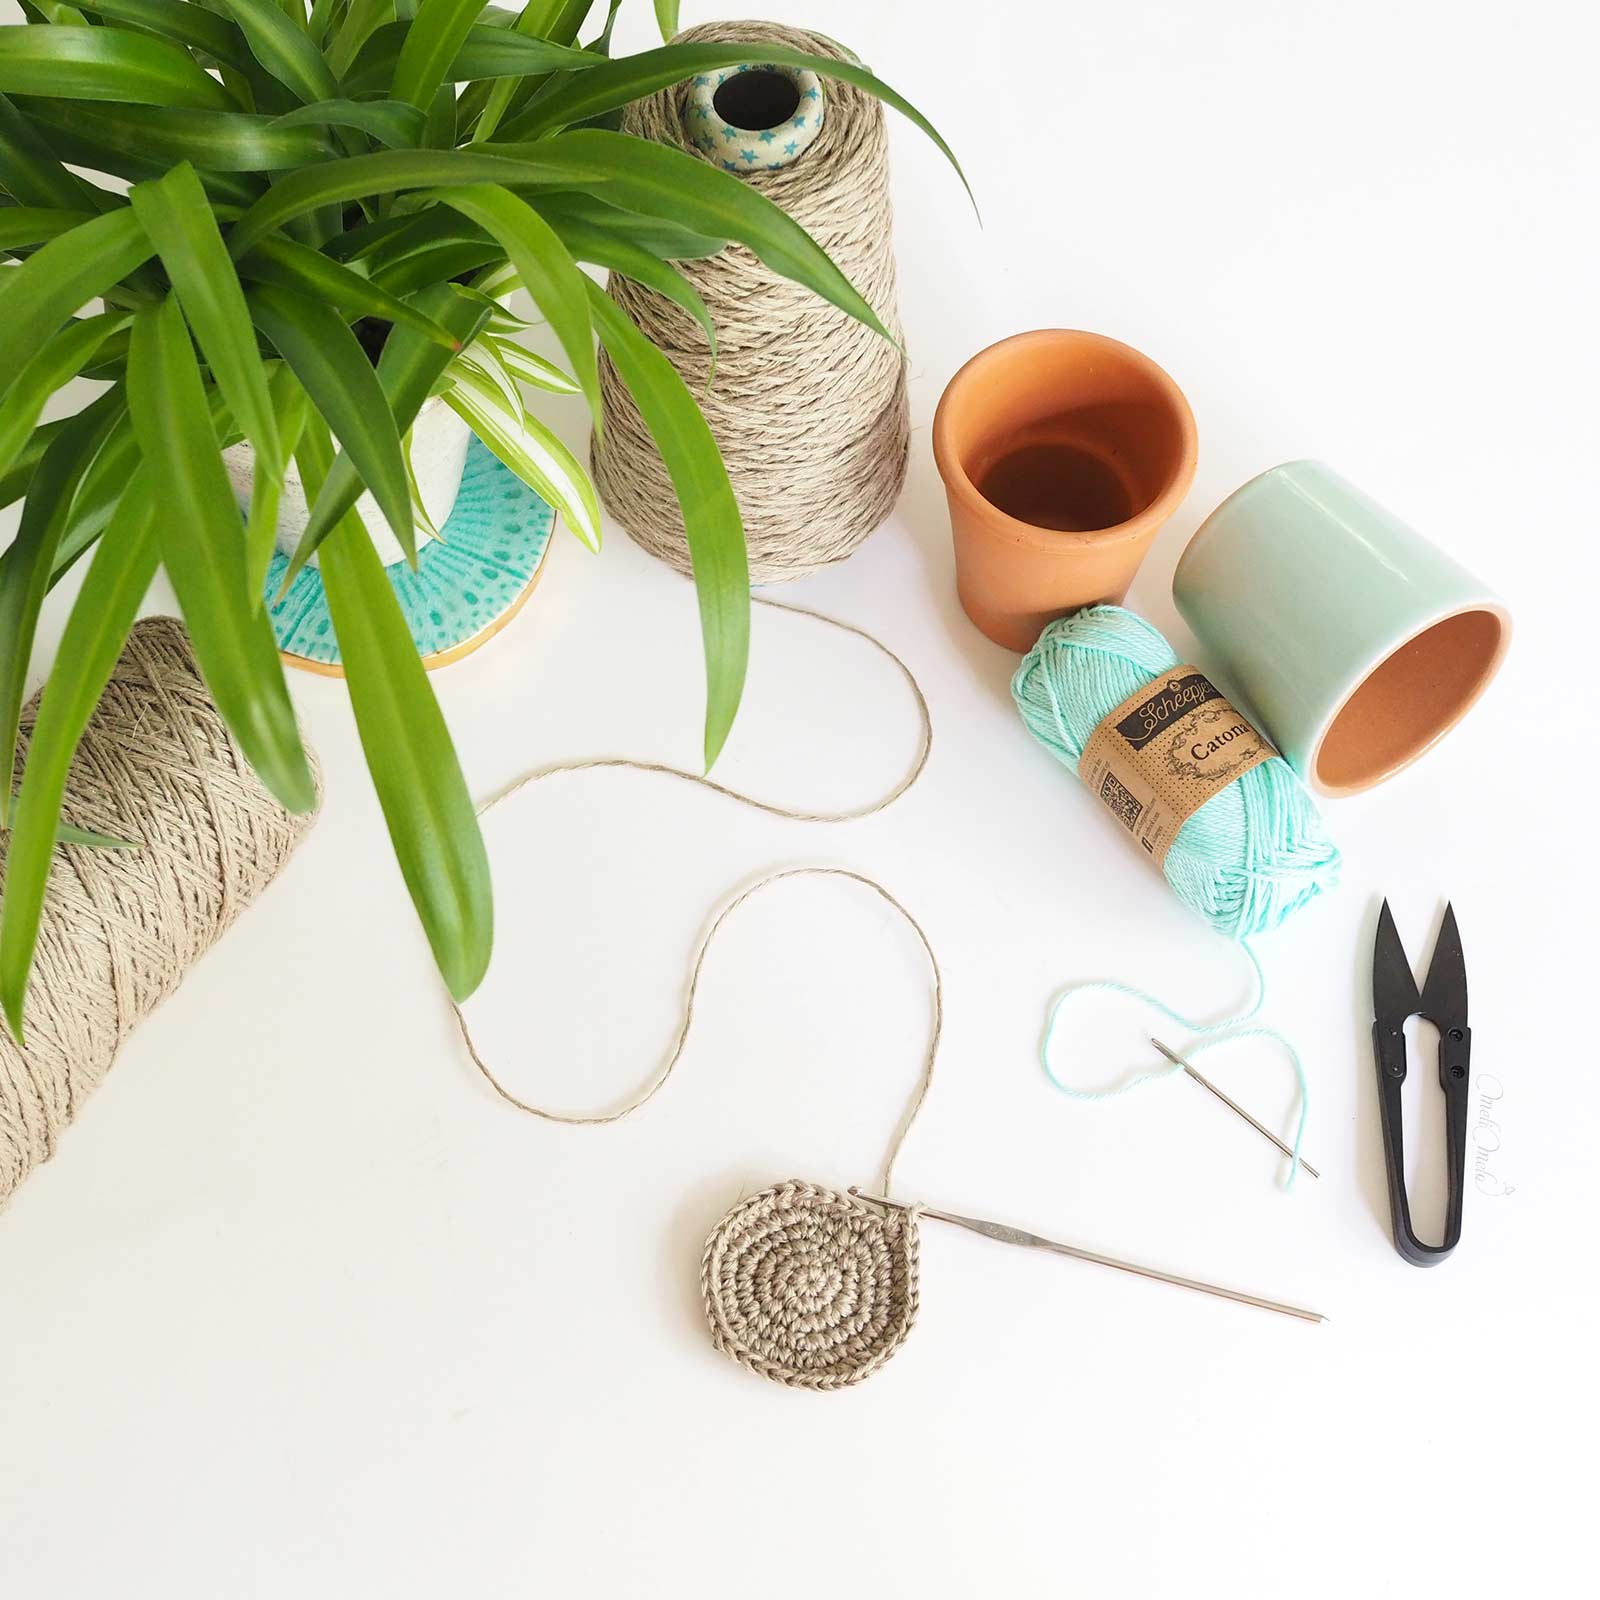 crochet Cotton Catona Scheepjes linen yarn Airedaleyarns laboutiquedemelimelo